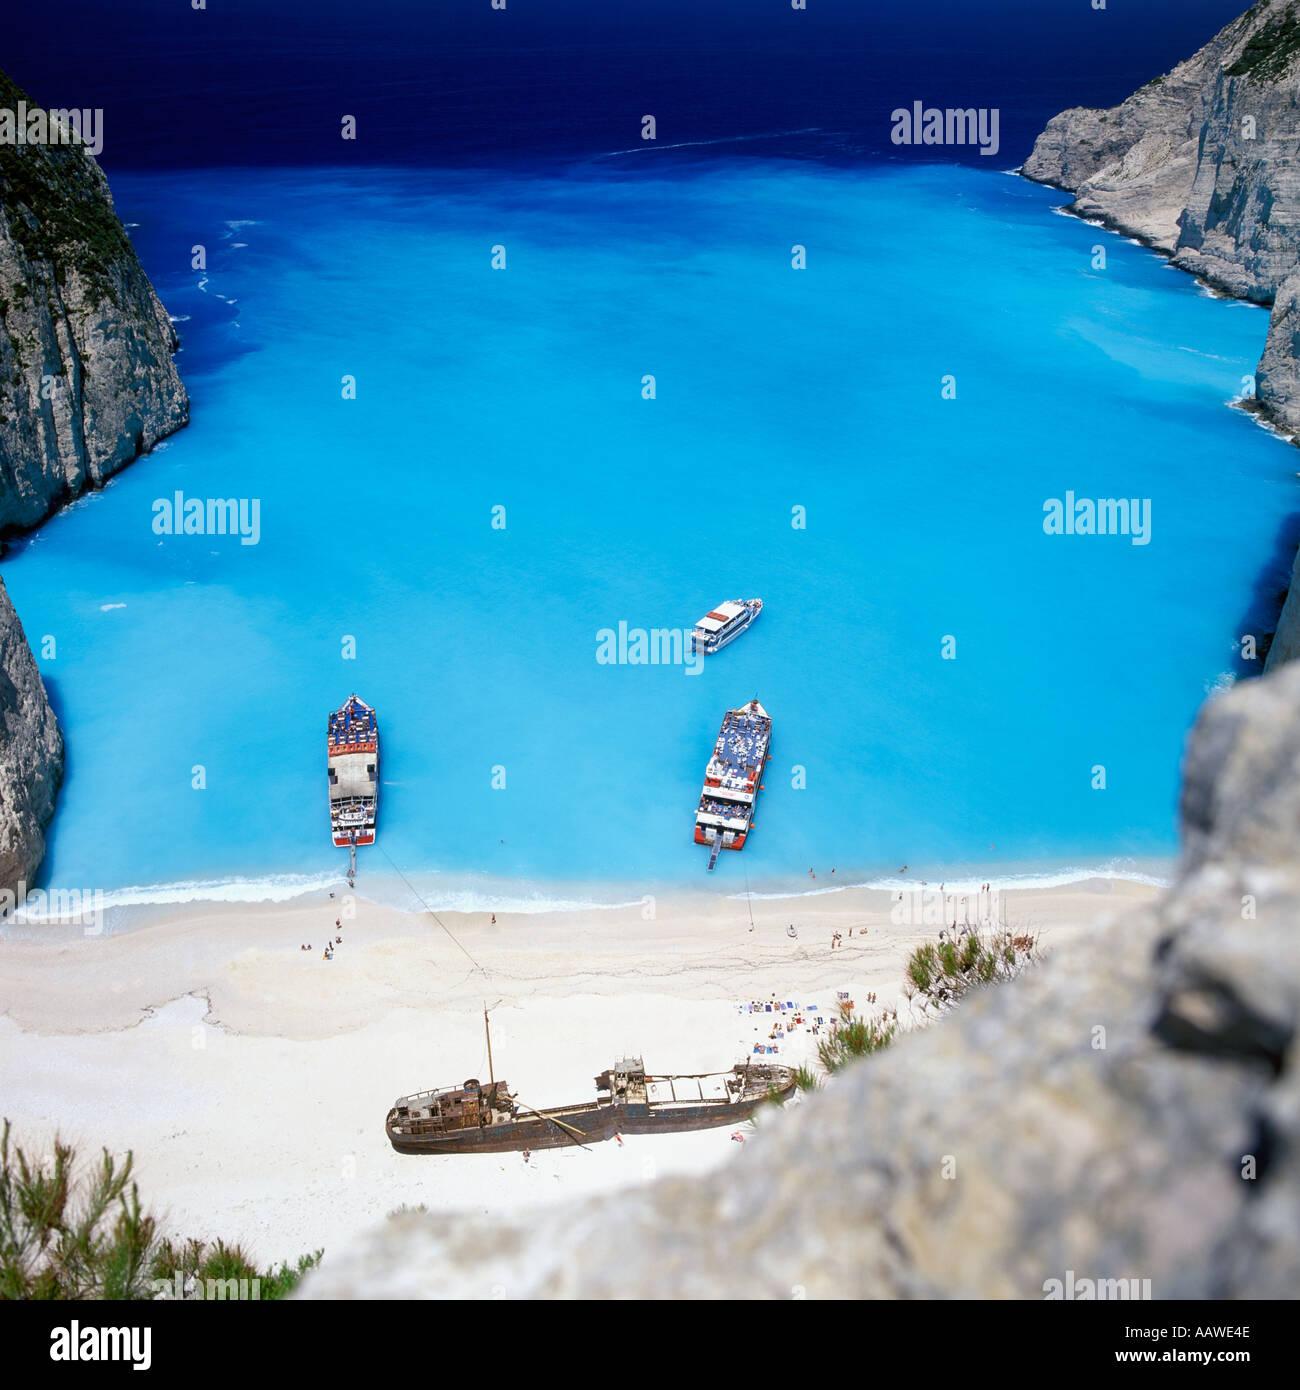 SHIPWRECK ON NAVAGIO BEACH ZAKYNTHOS GREECE - Stock Image